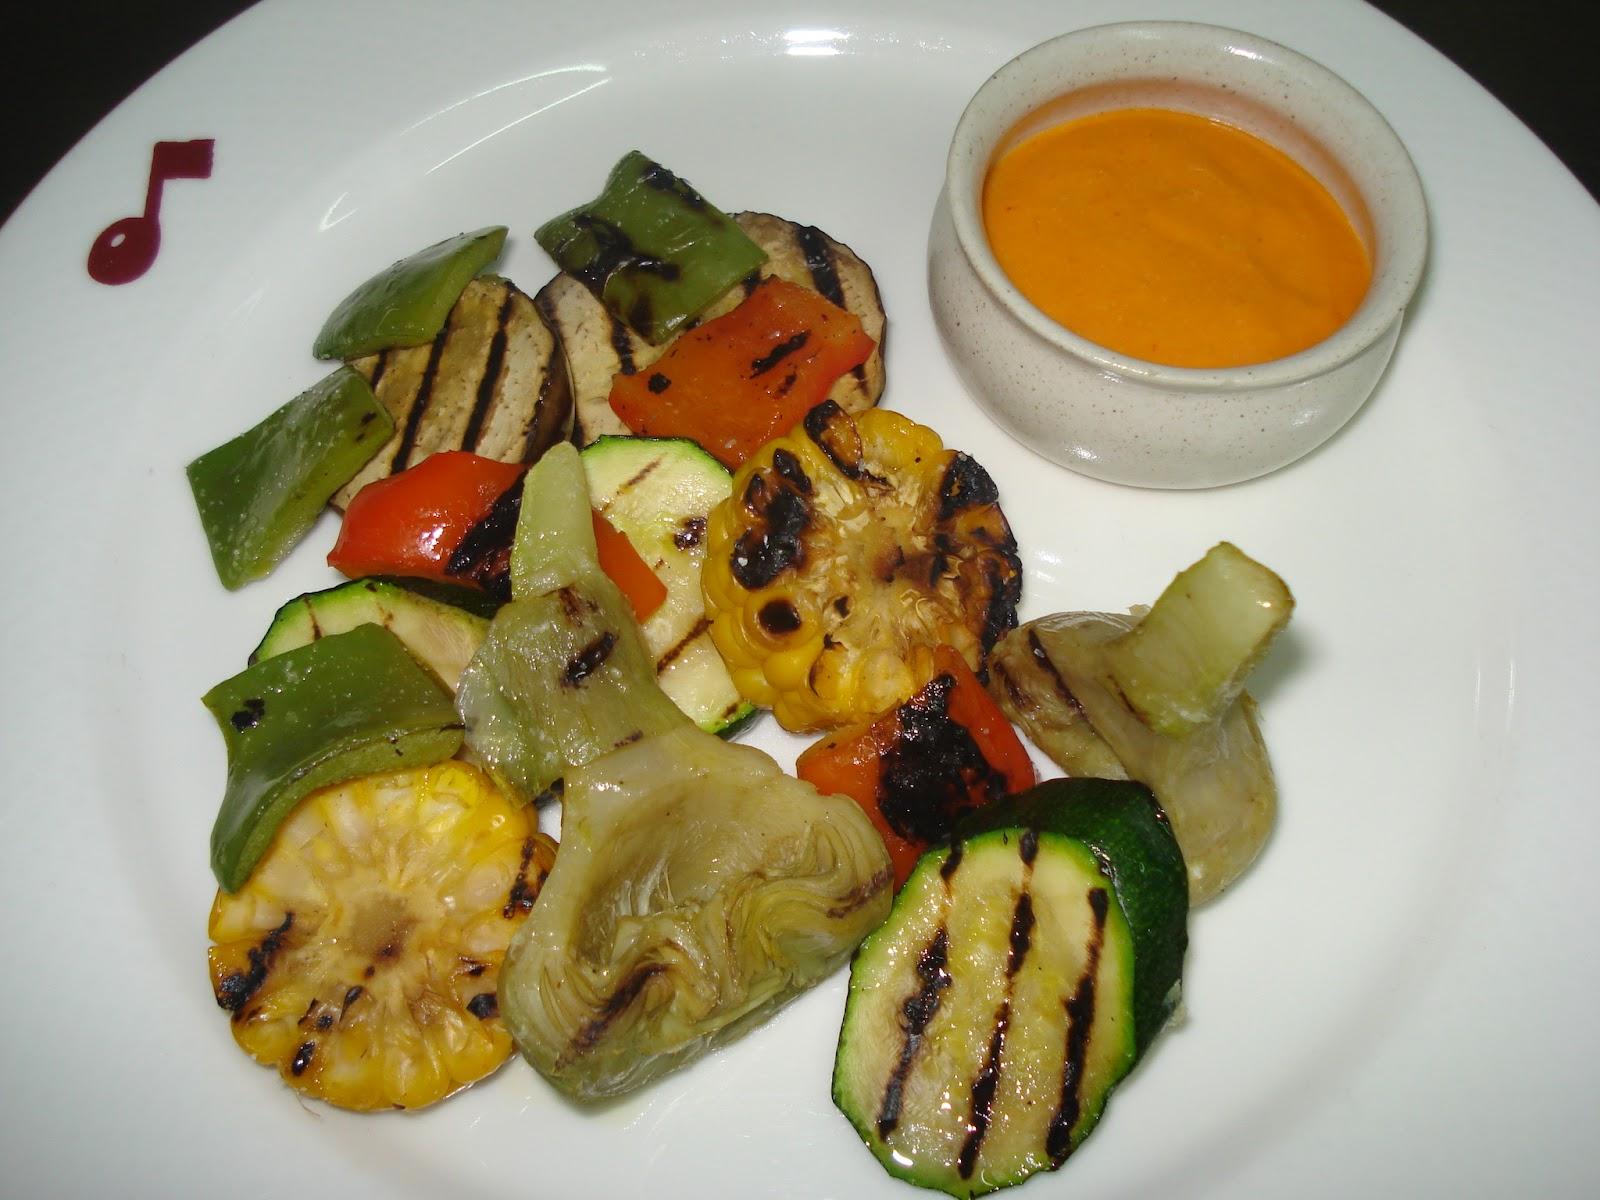 Kabanova comedor parrillada de verduras con salsa romescu for Parrillada verduras